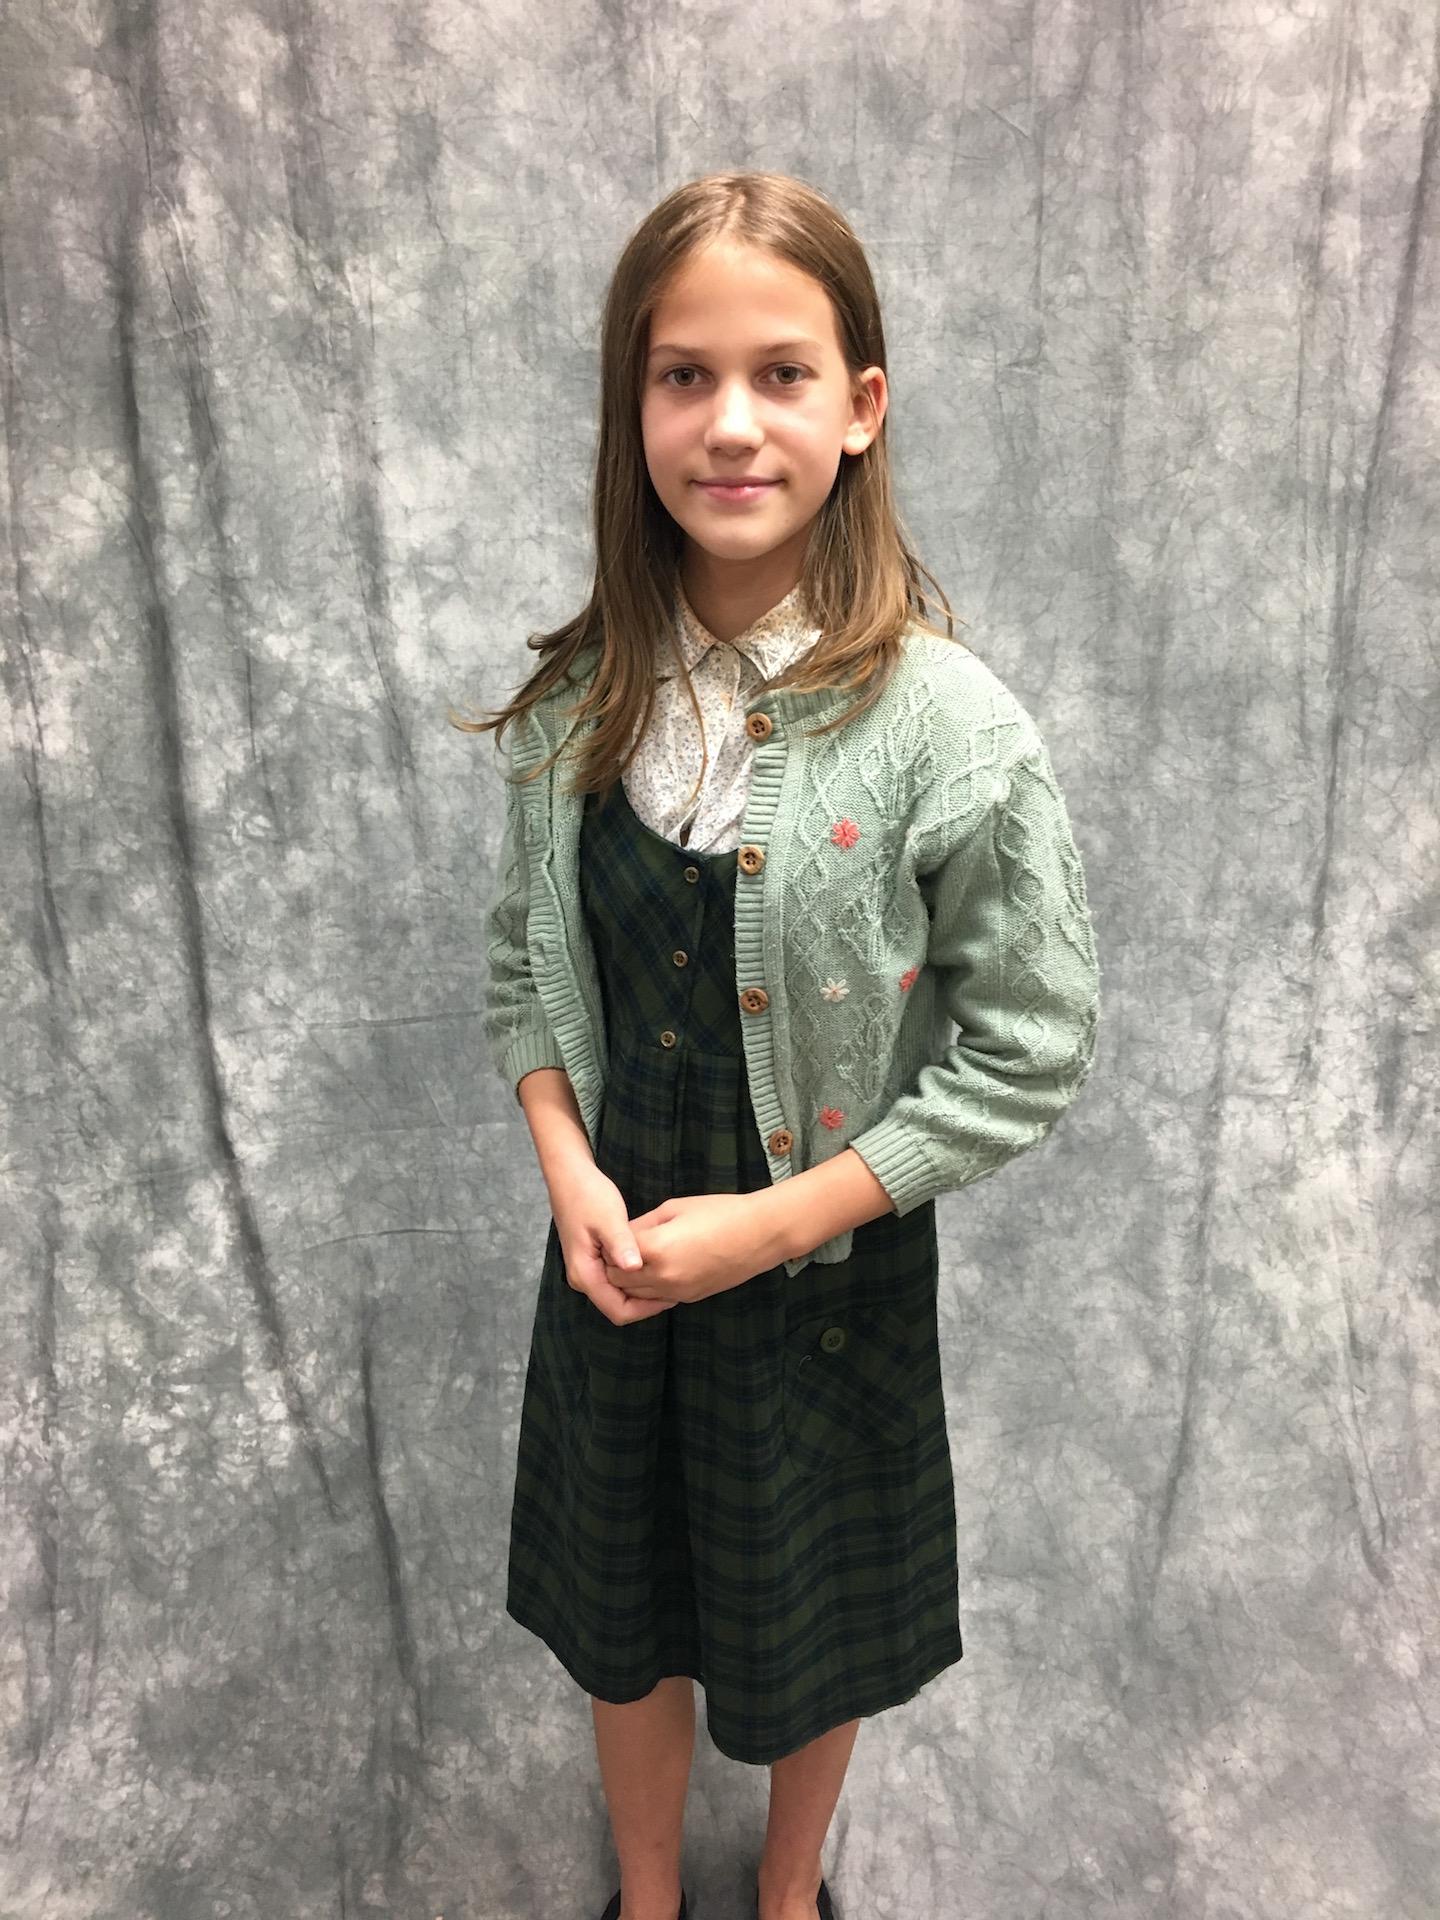 LWW Narnia Lucy Pevensie Wartime Costume vs1